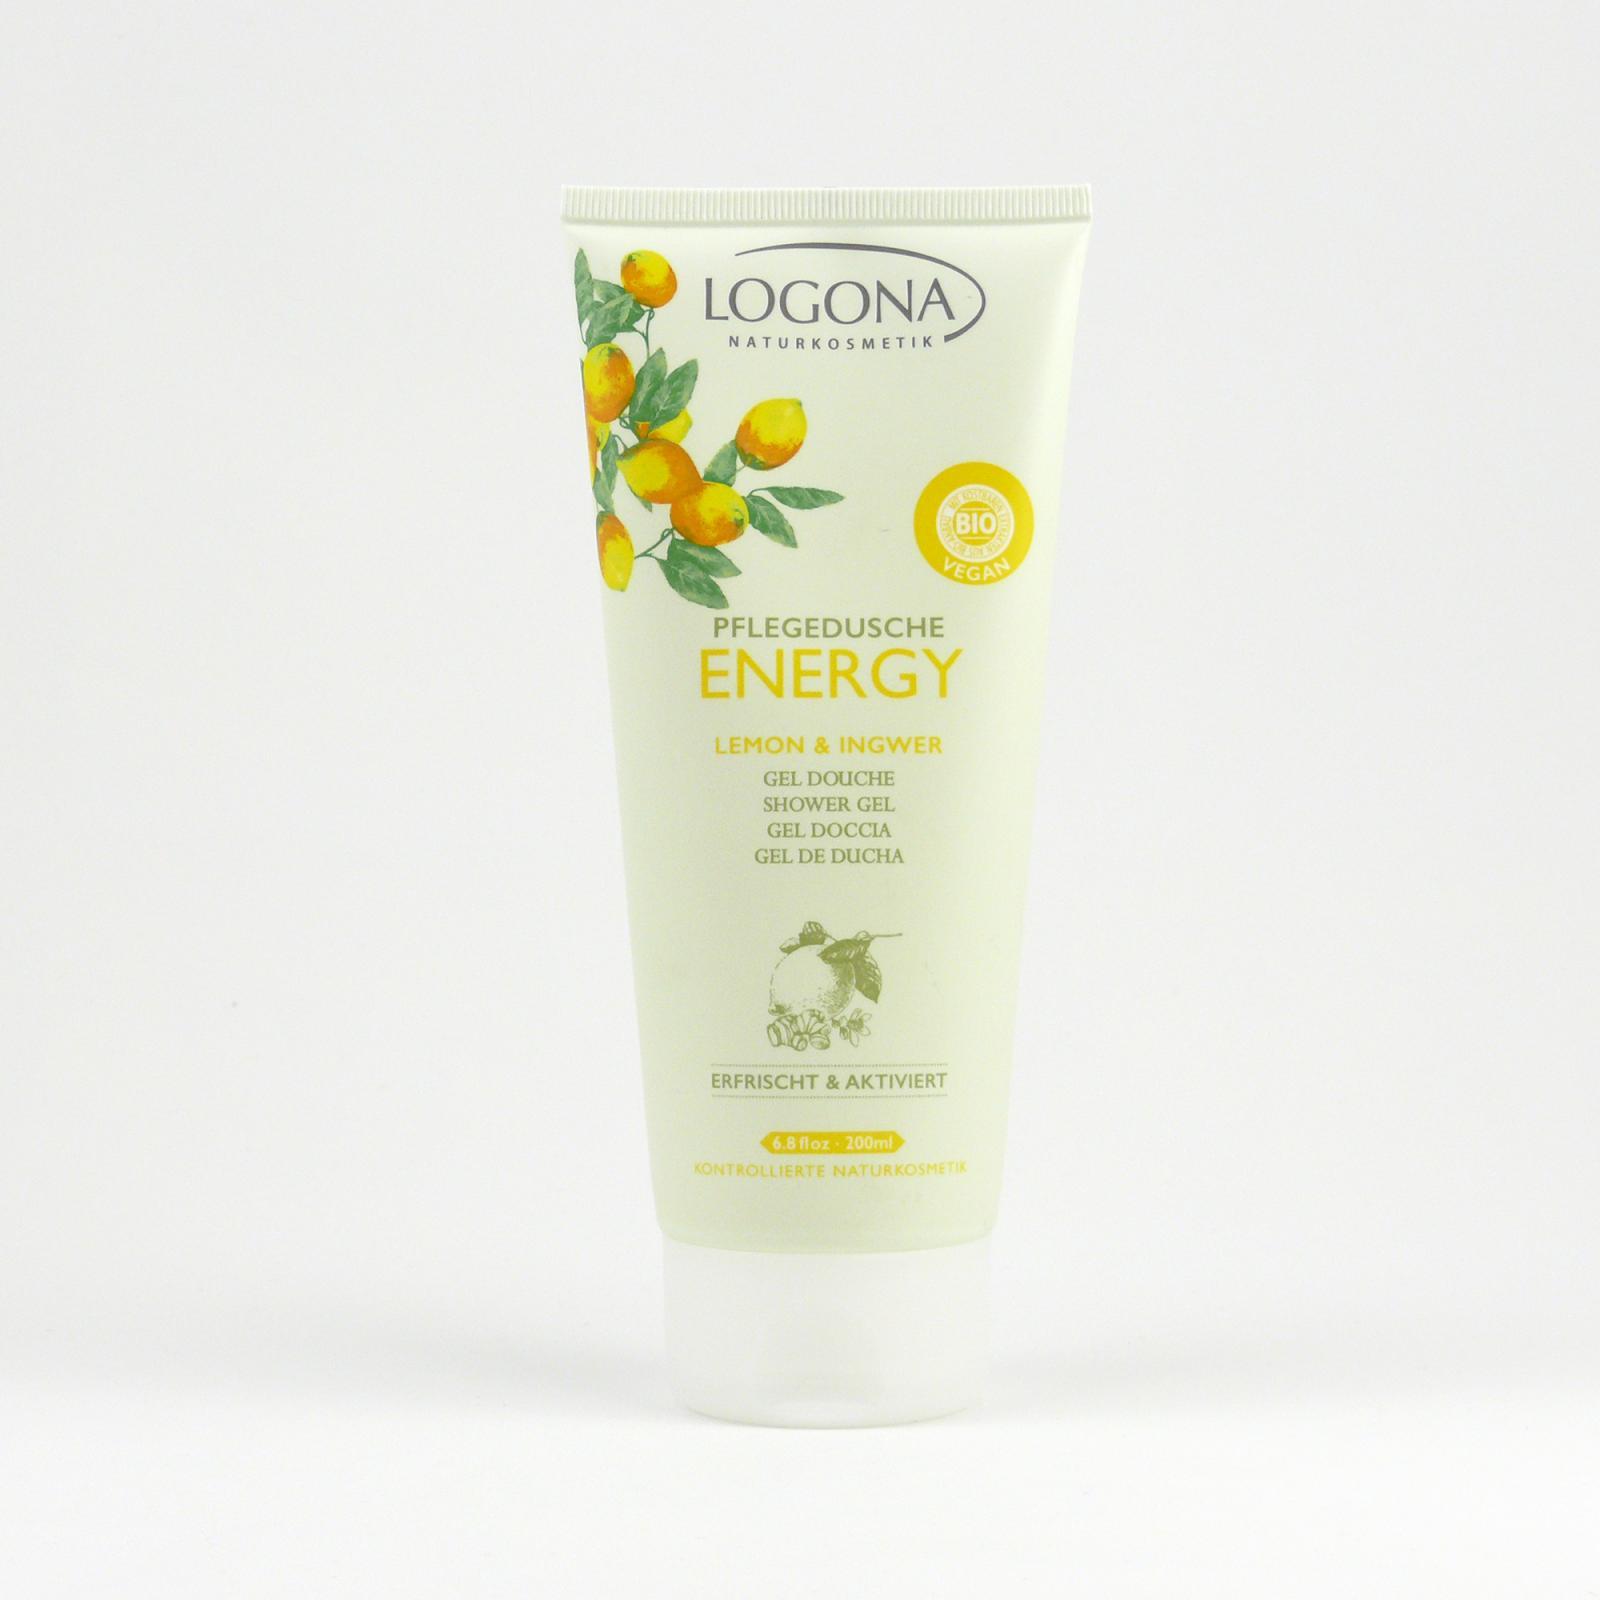 Logona Sprchový gel citron a zázvor, Energy 200 ml